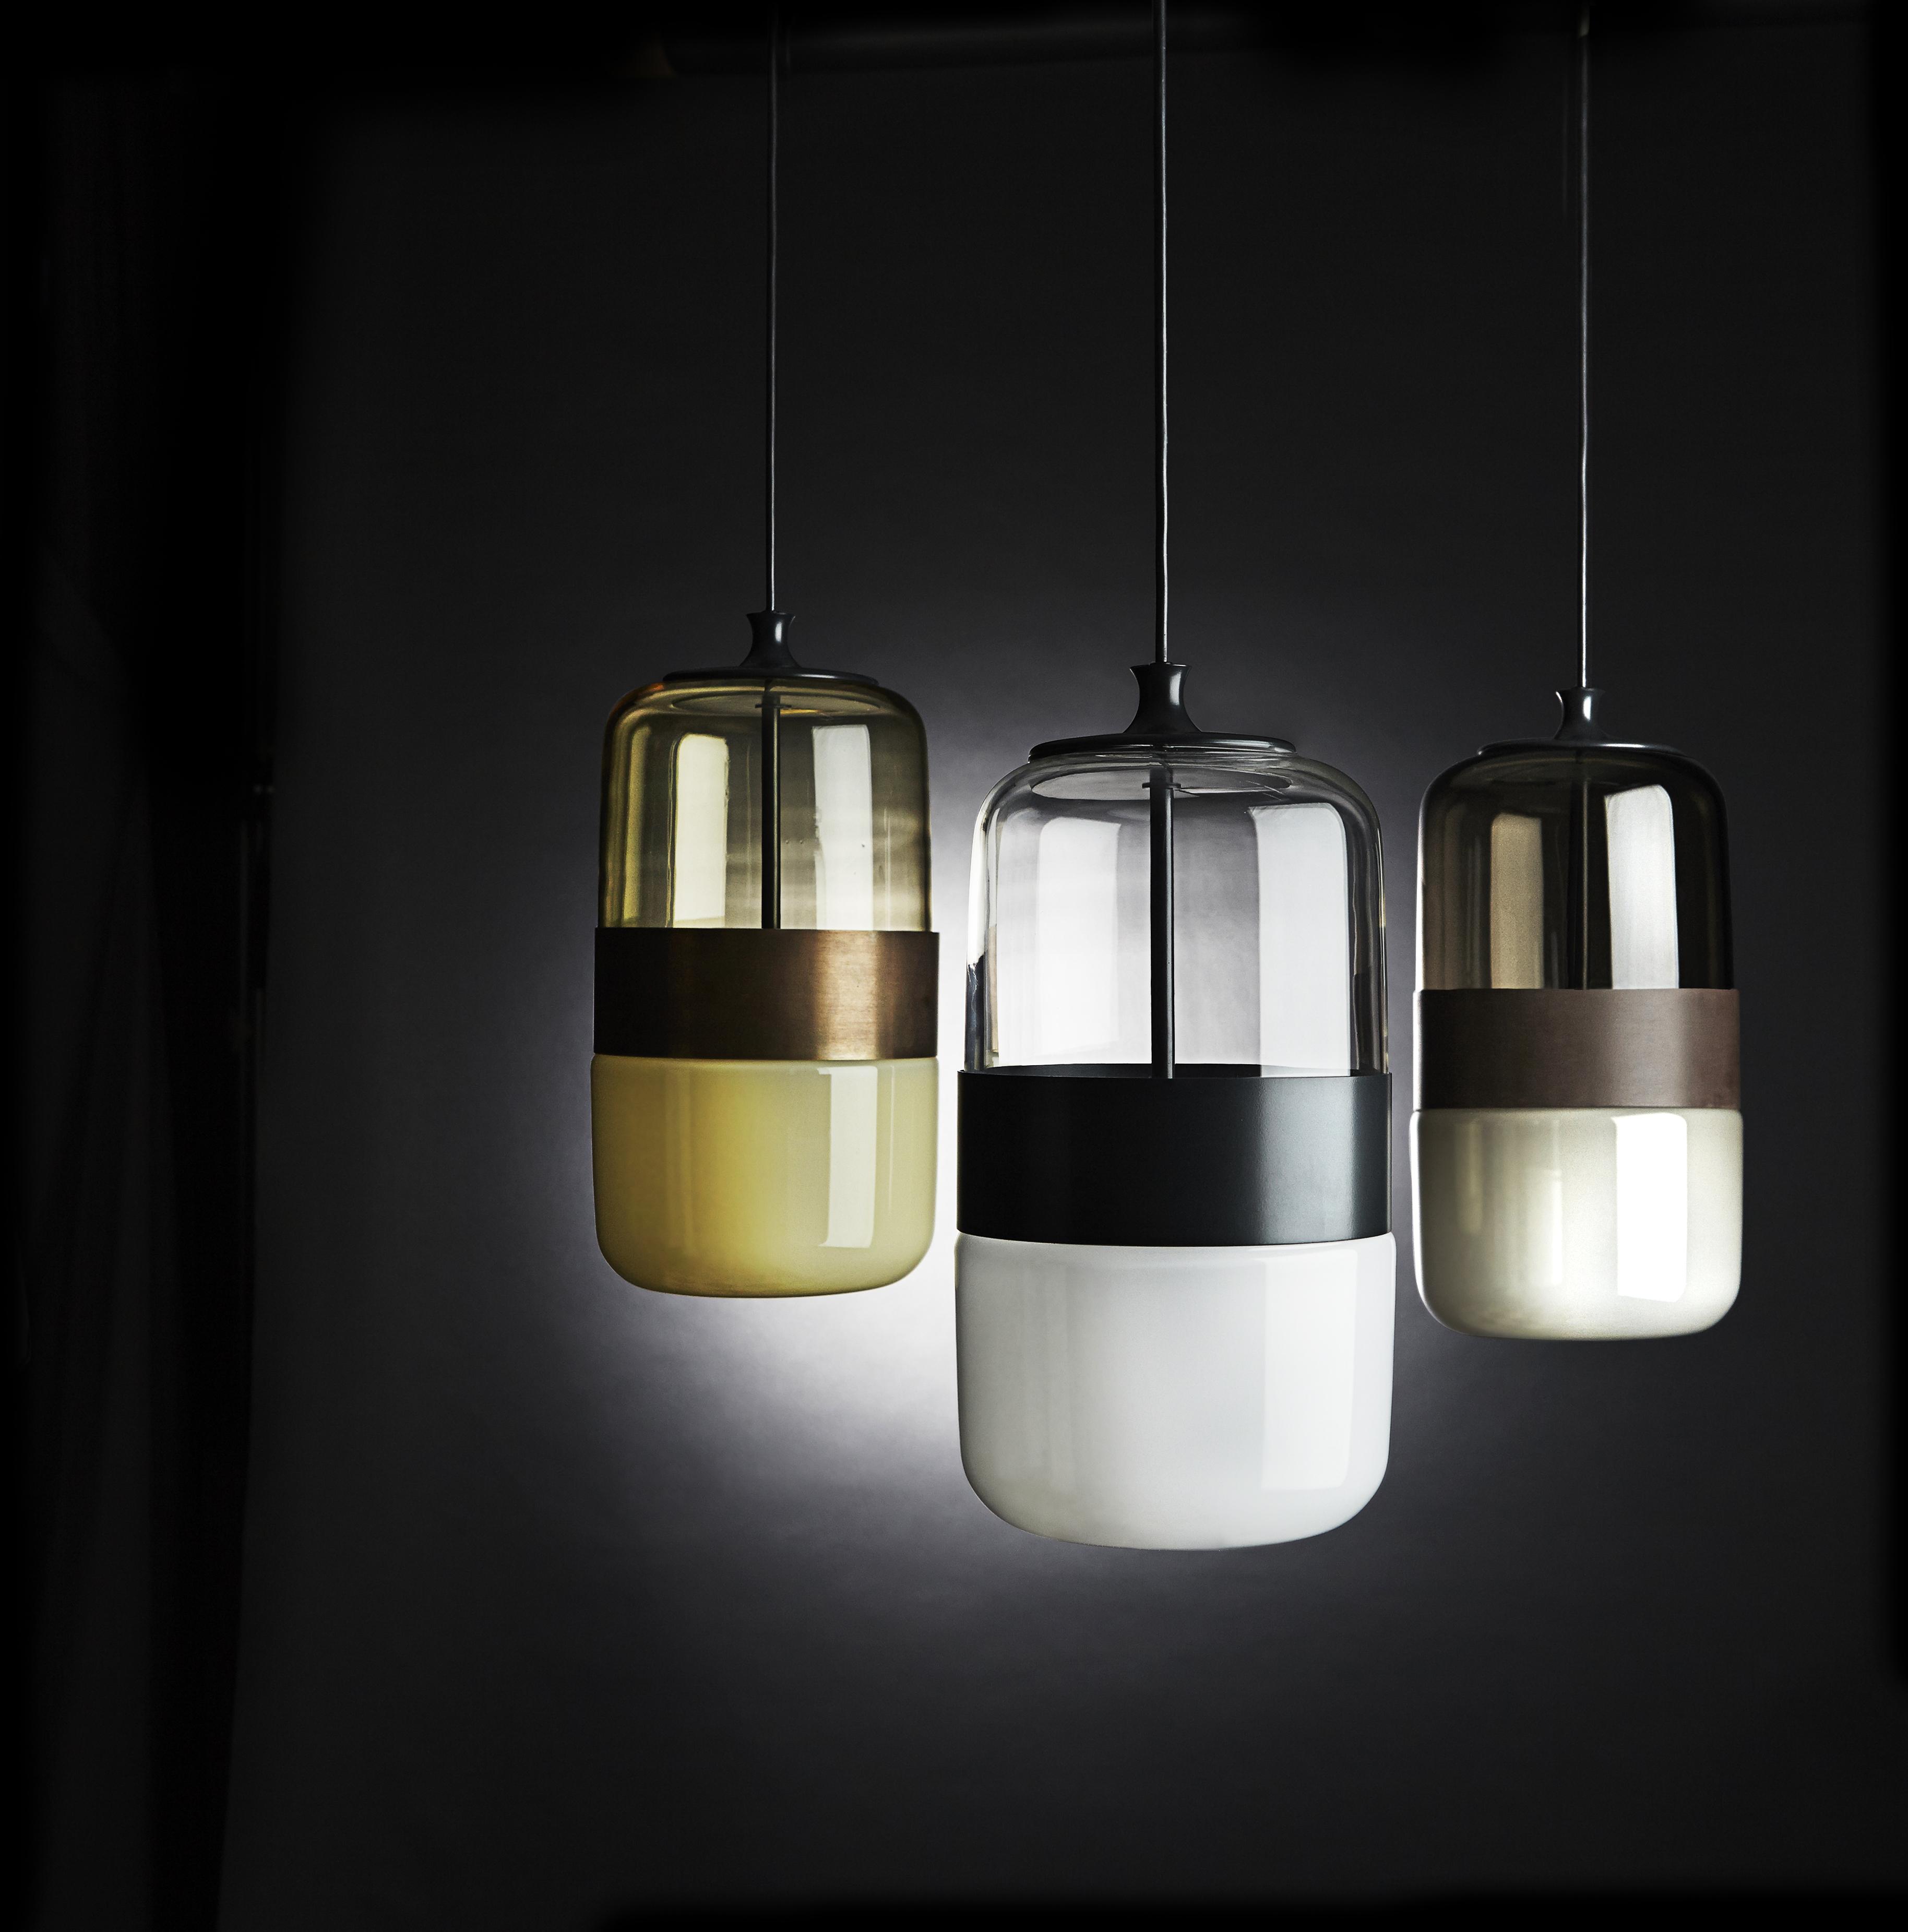 FUTURA LIGHTING SYSTEM By Hangar Design Group